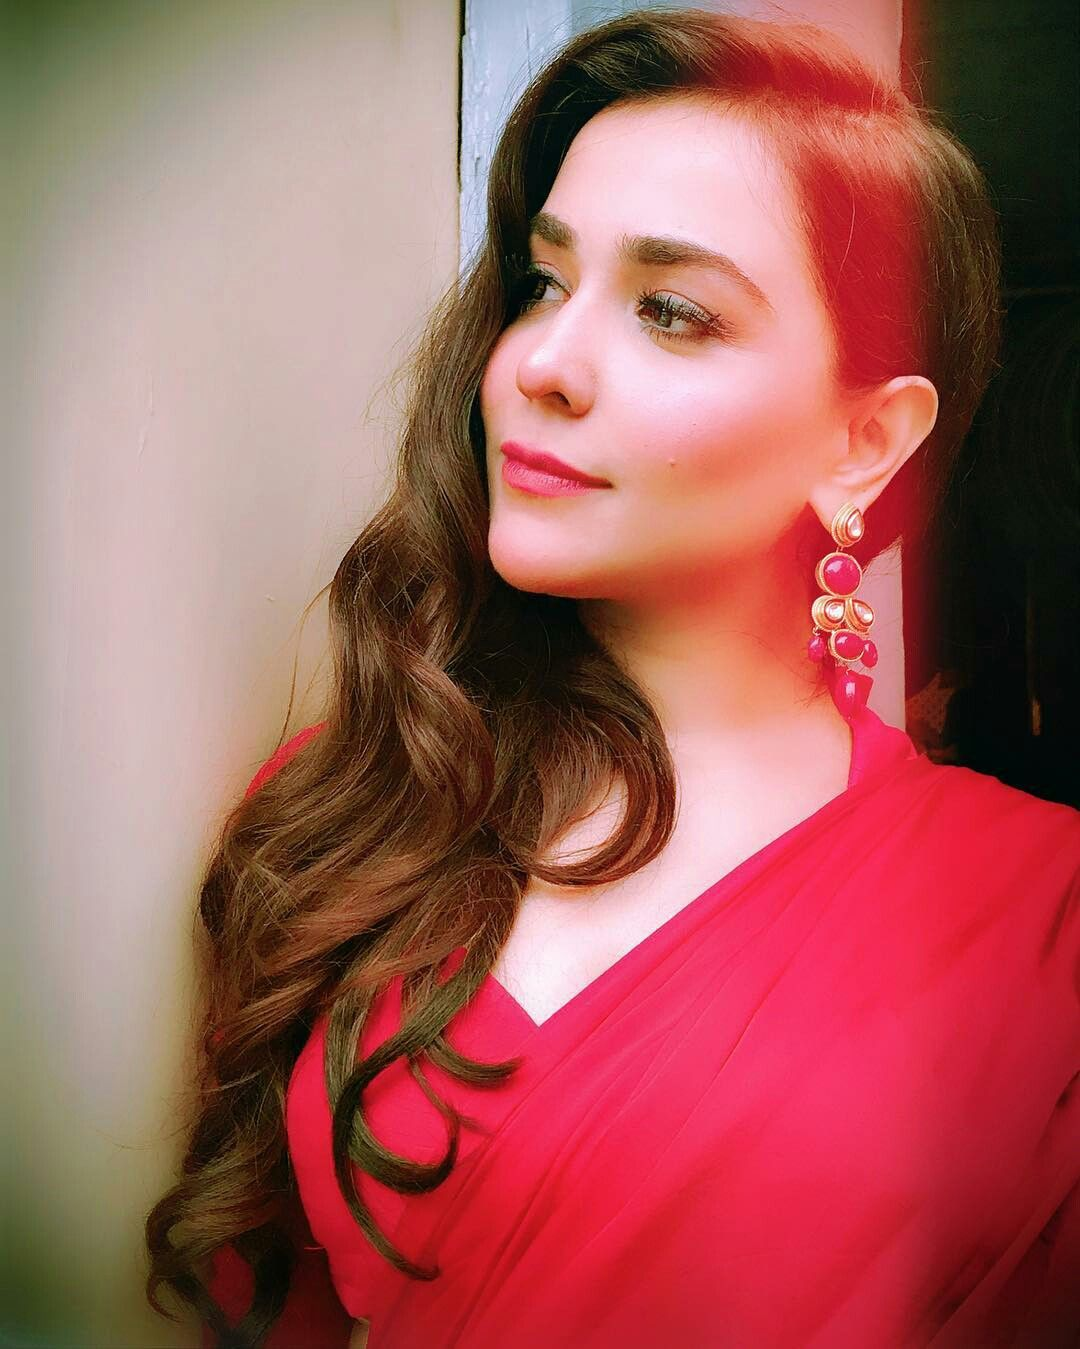 Pin by Asma Mujeer ∞ on Celebrities Glamorous makeup